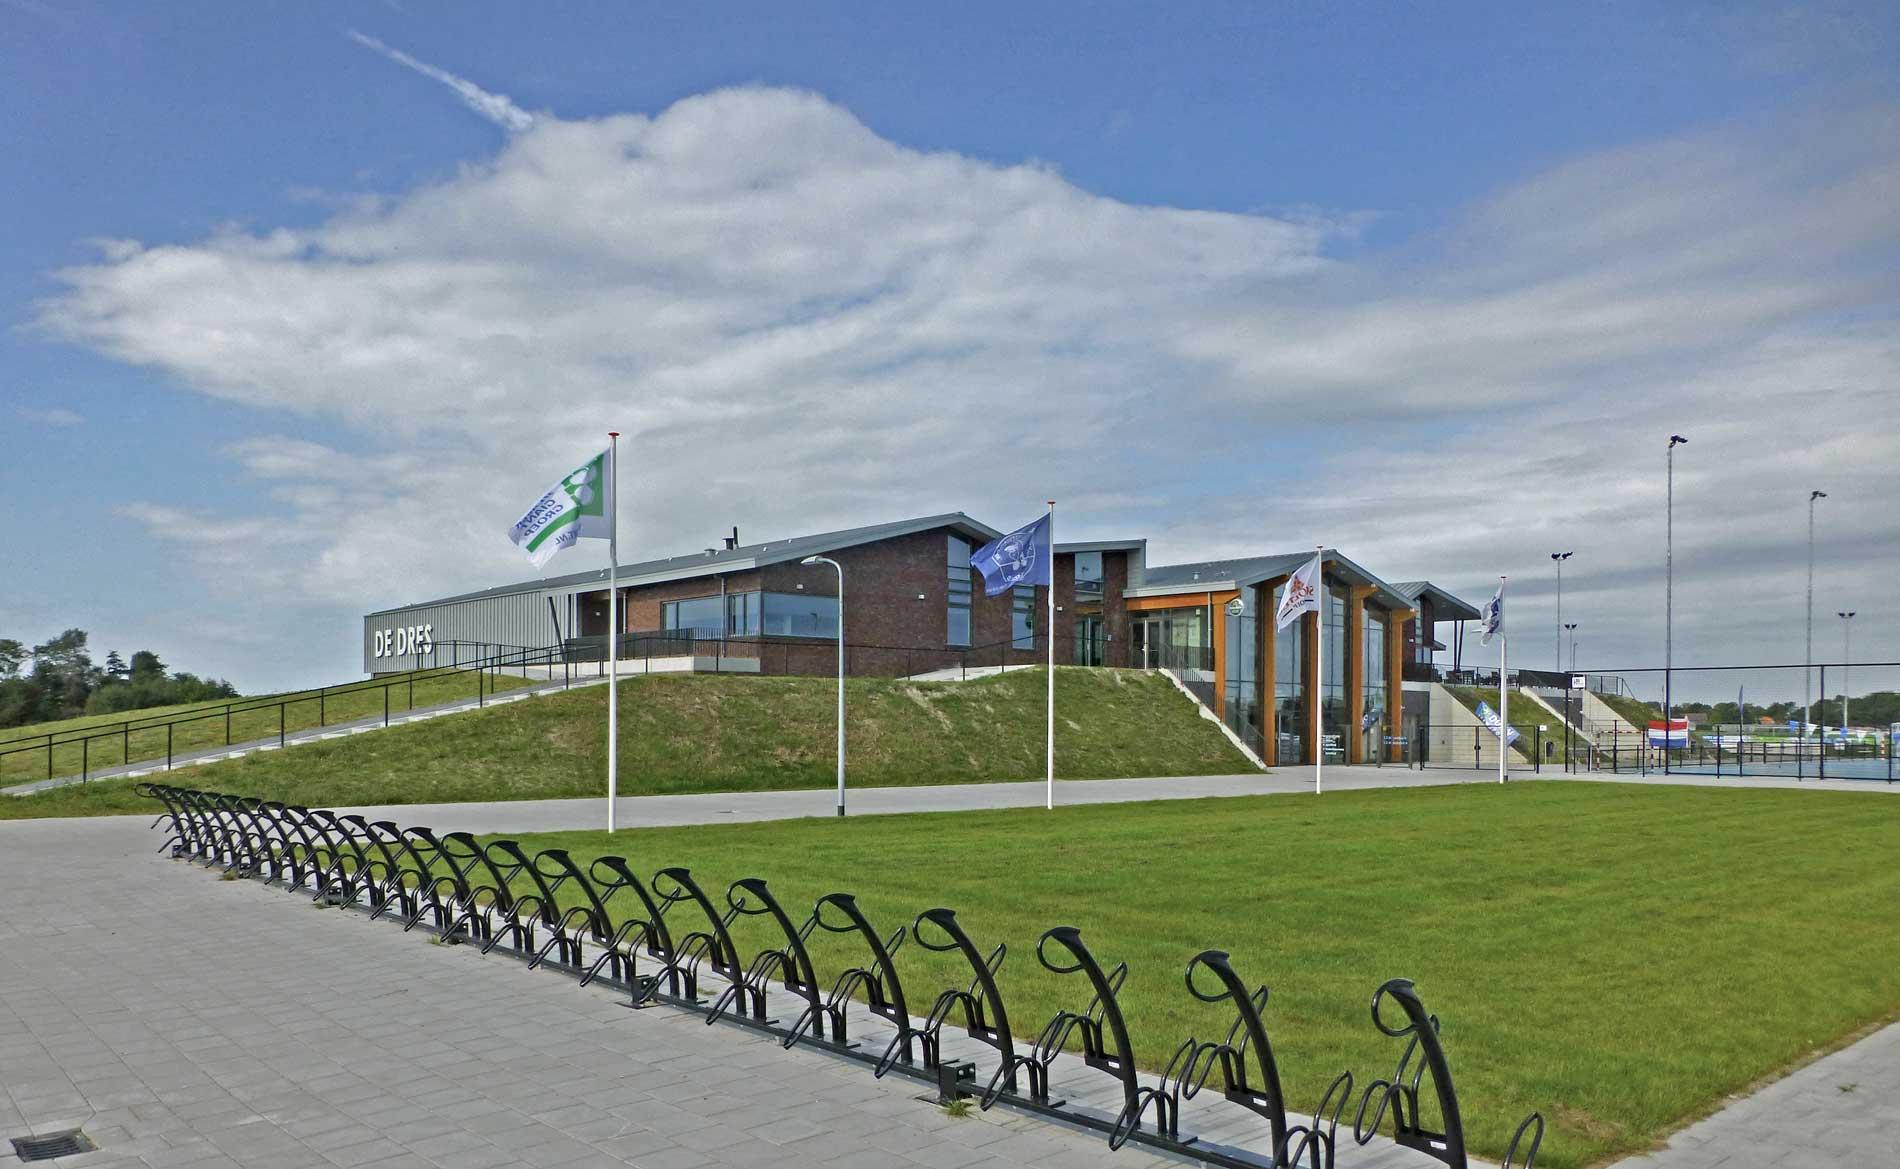 architect MFA multifunctionele accommodatie sporthal sport De Dres Nibbixwoud BBHD architecten